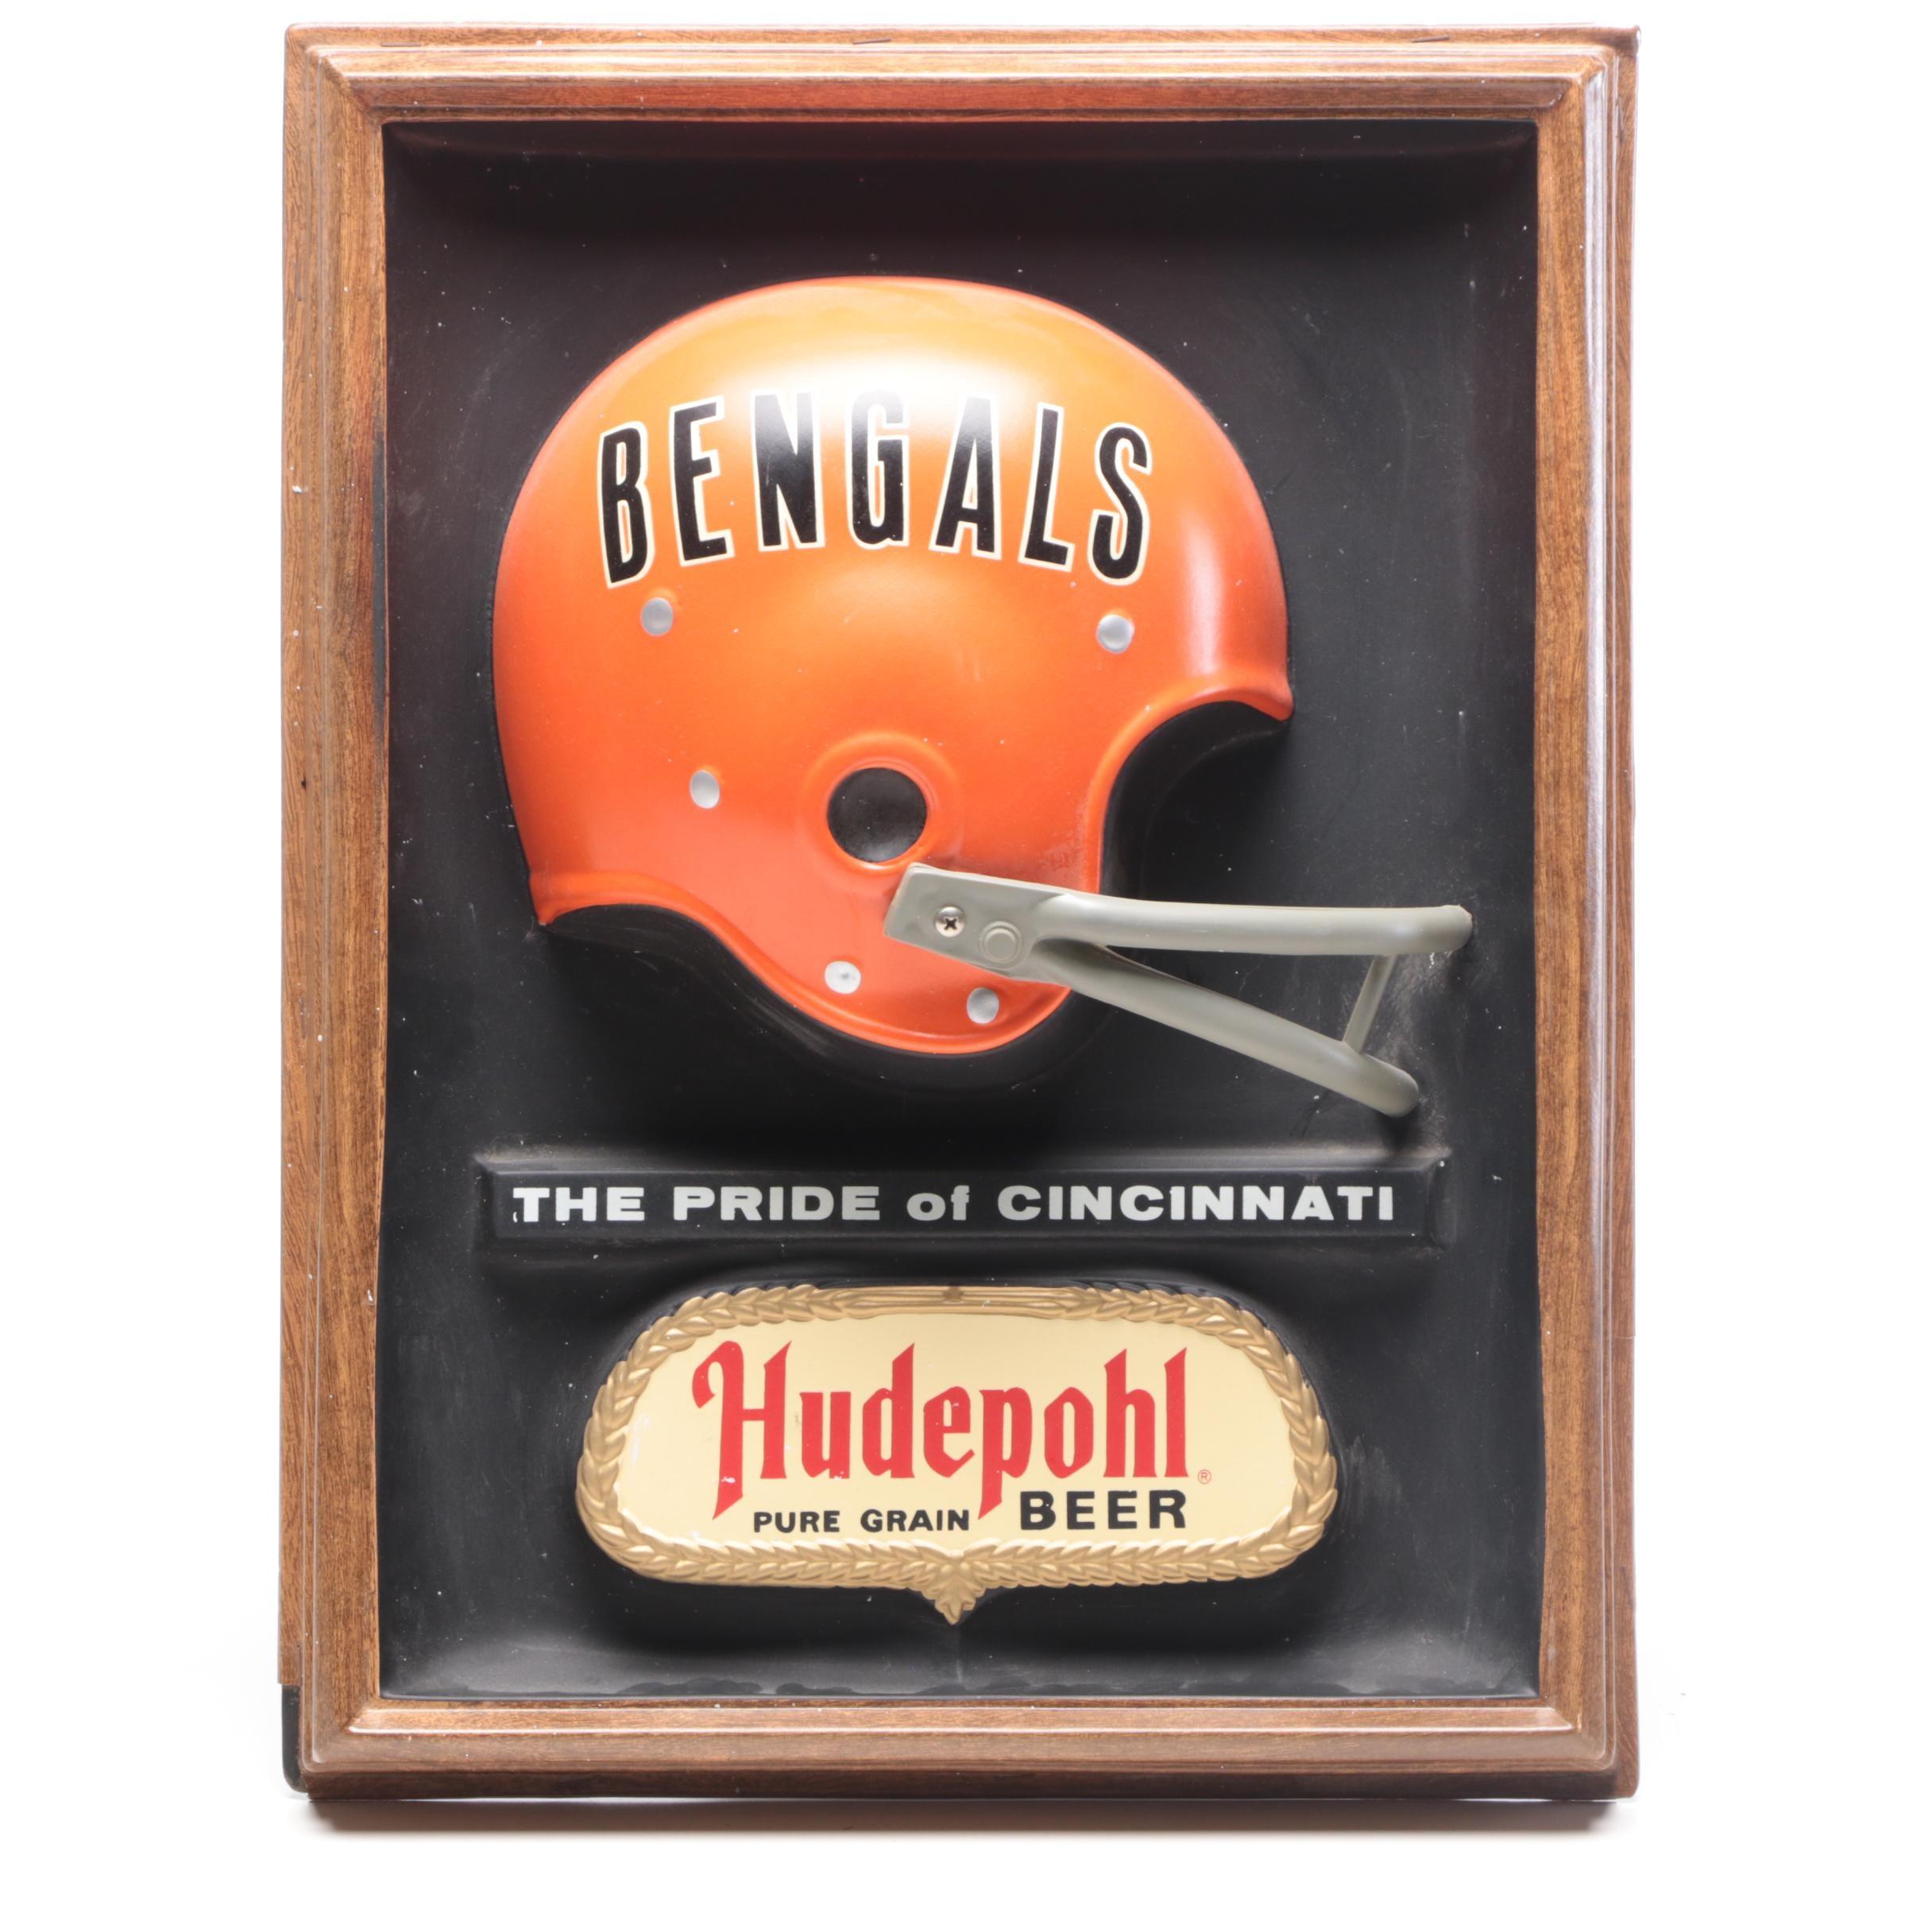 1977 Cincinnati Bengals Hudepohl Beer Wall Mount Advertising Sign